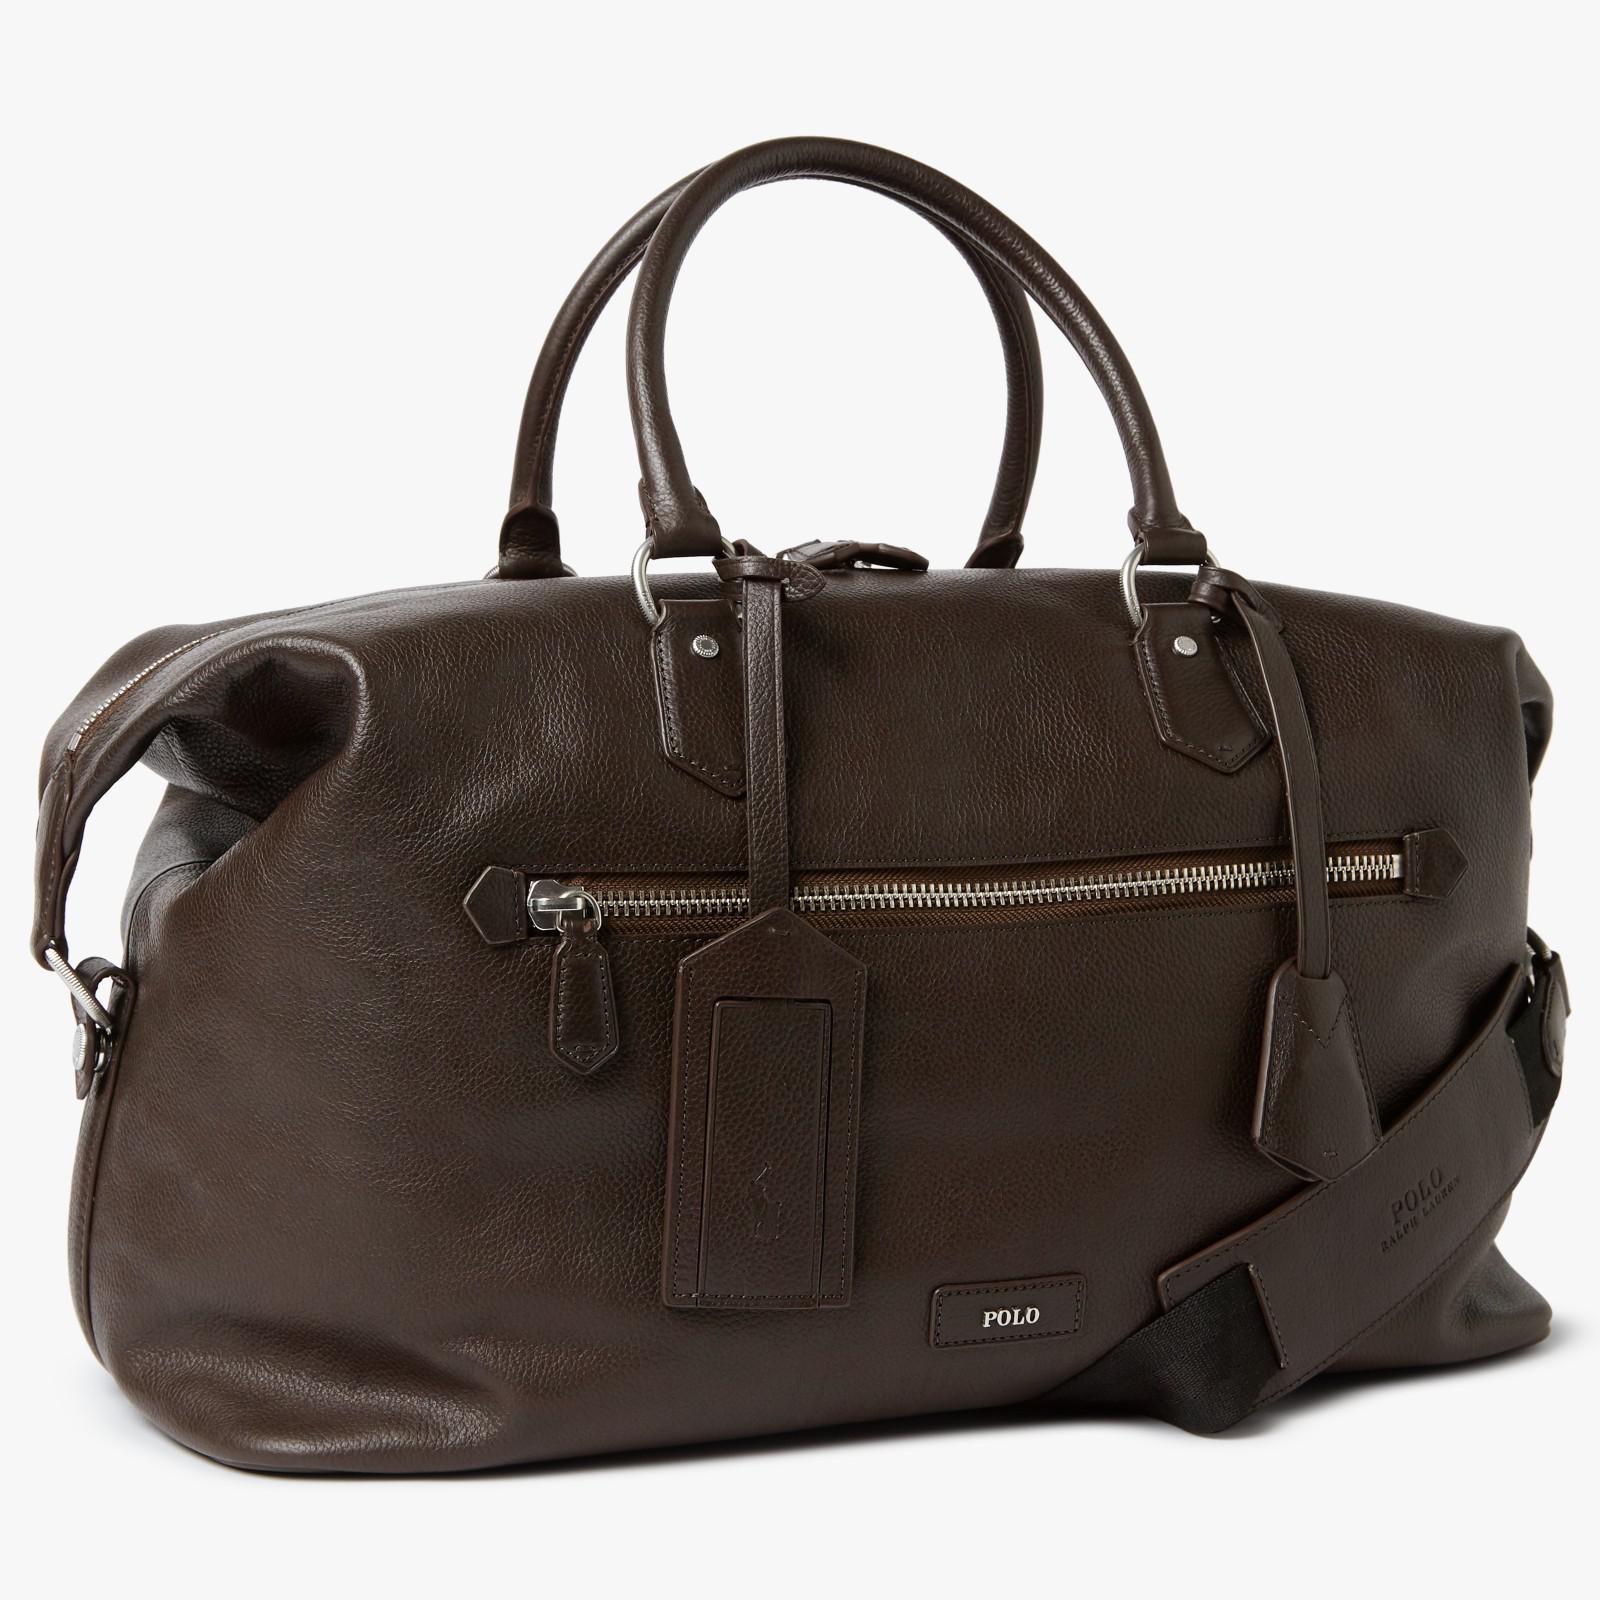 b2ba814ed75 Ralph Lauren Polo Pebble Leather Duffle Bag in Brown for Men - Lyst